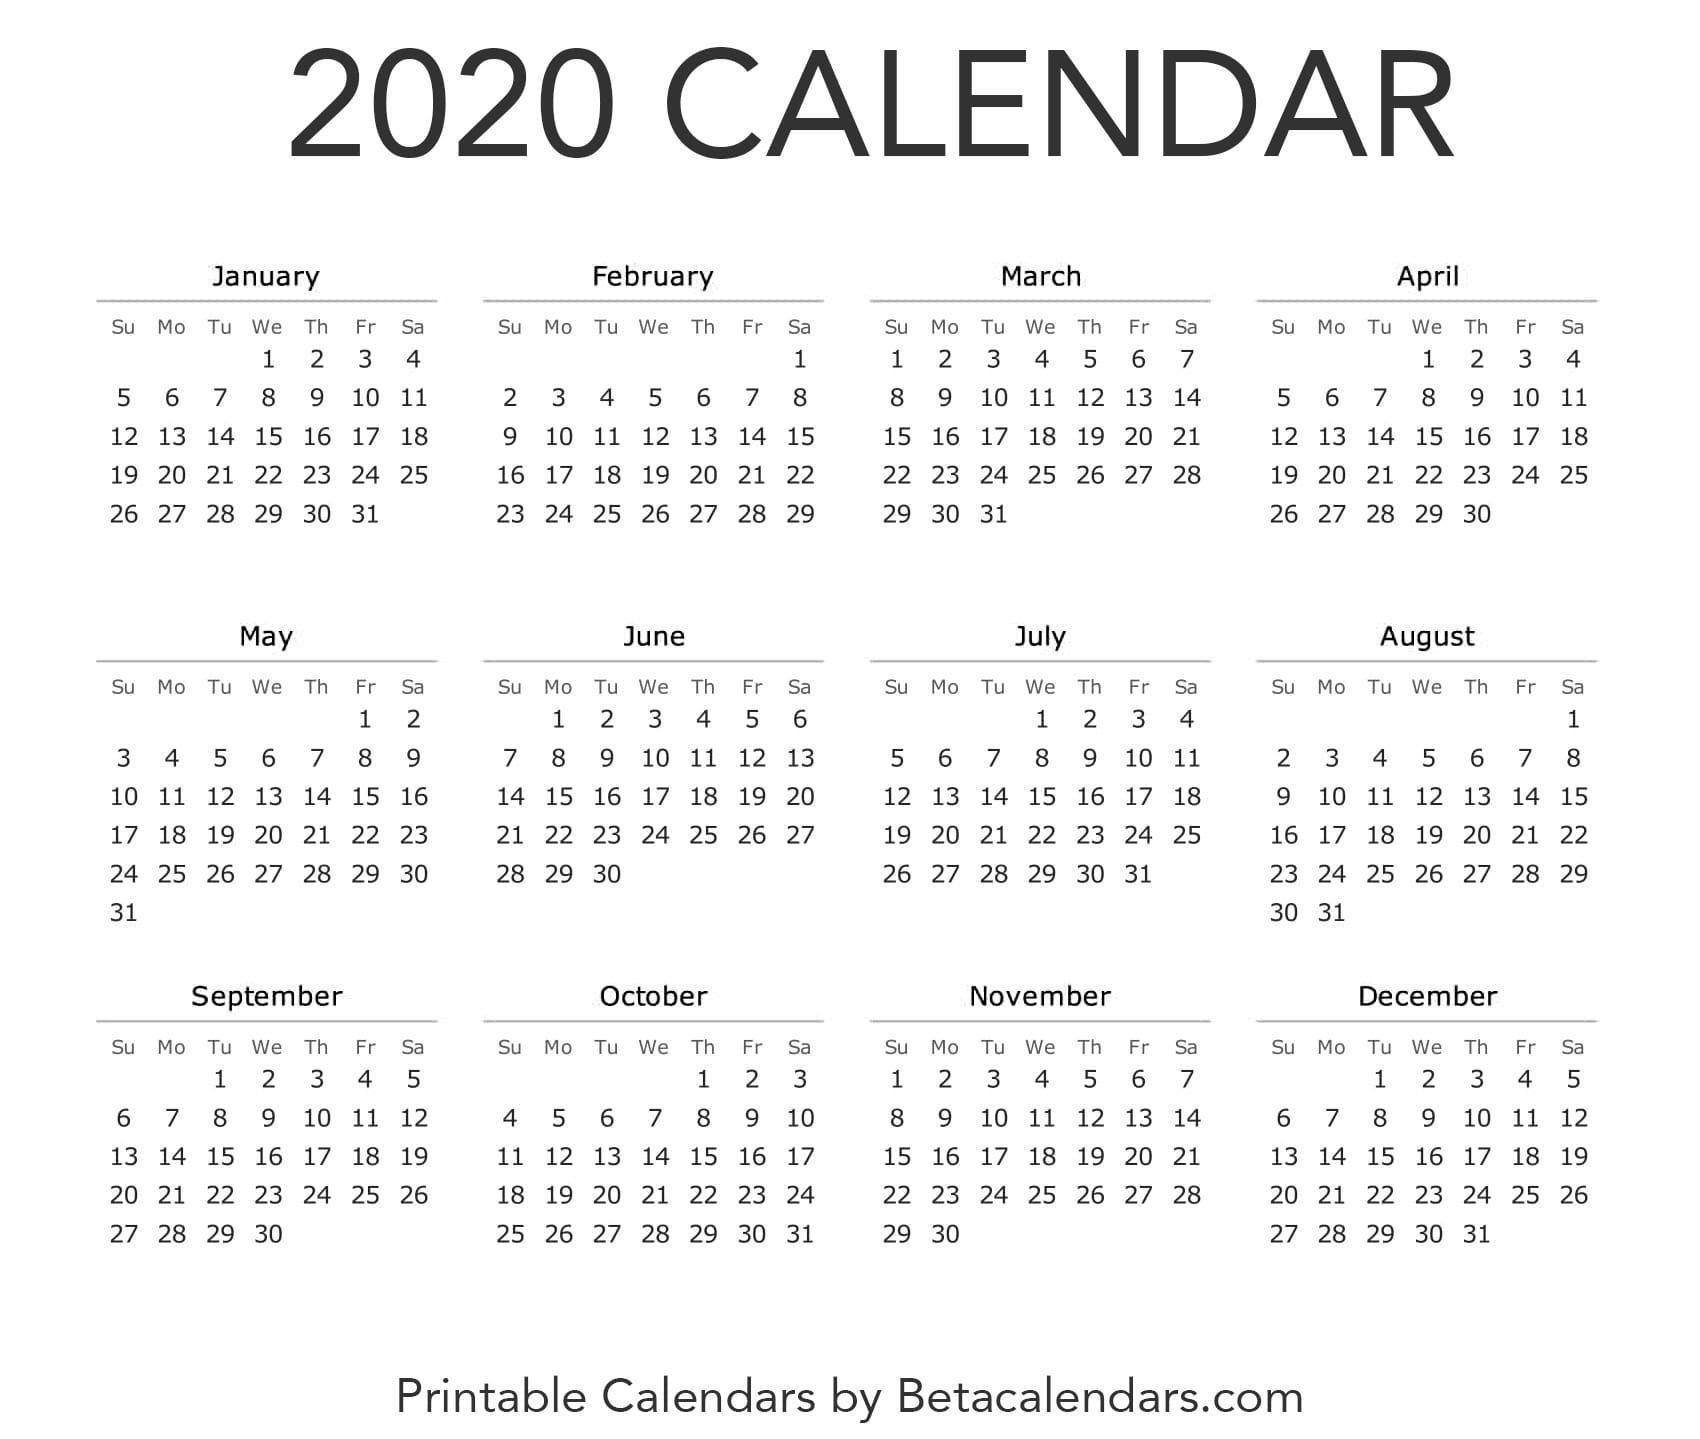 Calendar 2020 | Printable Yearly Calendar, Calendar, Yearly